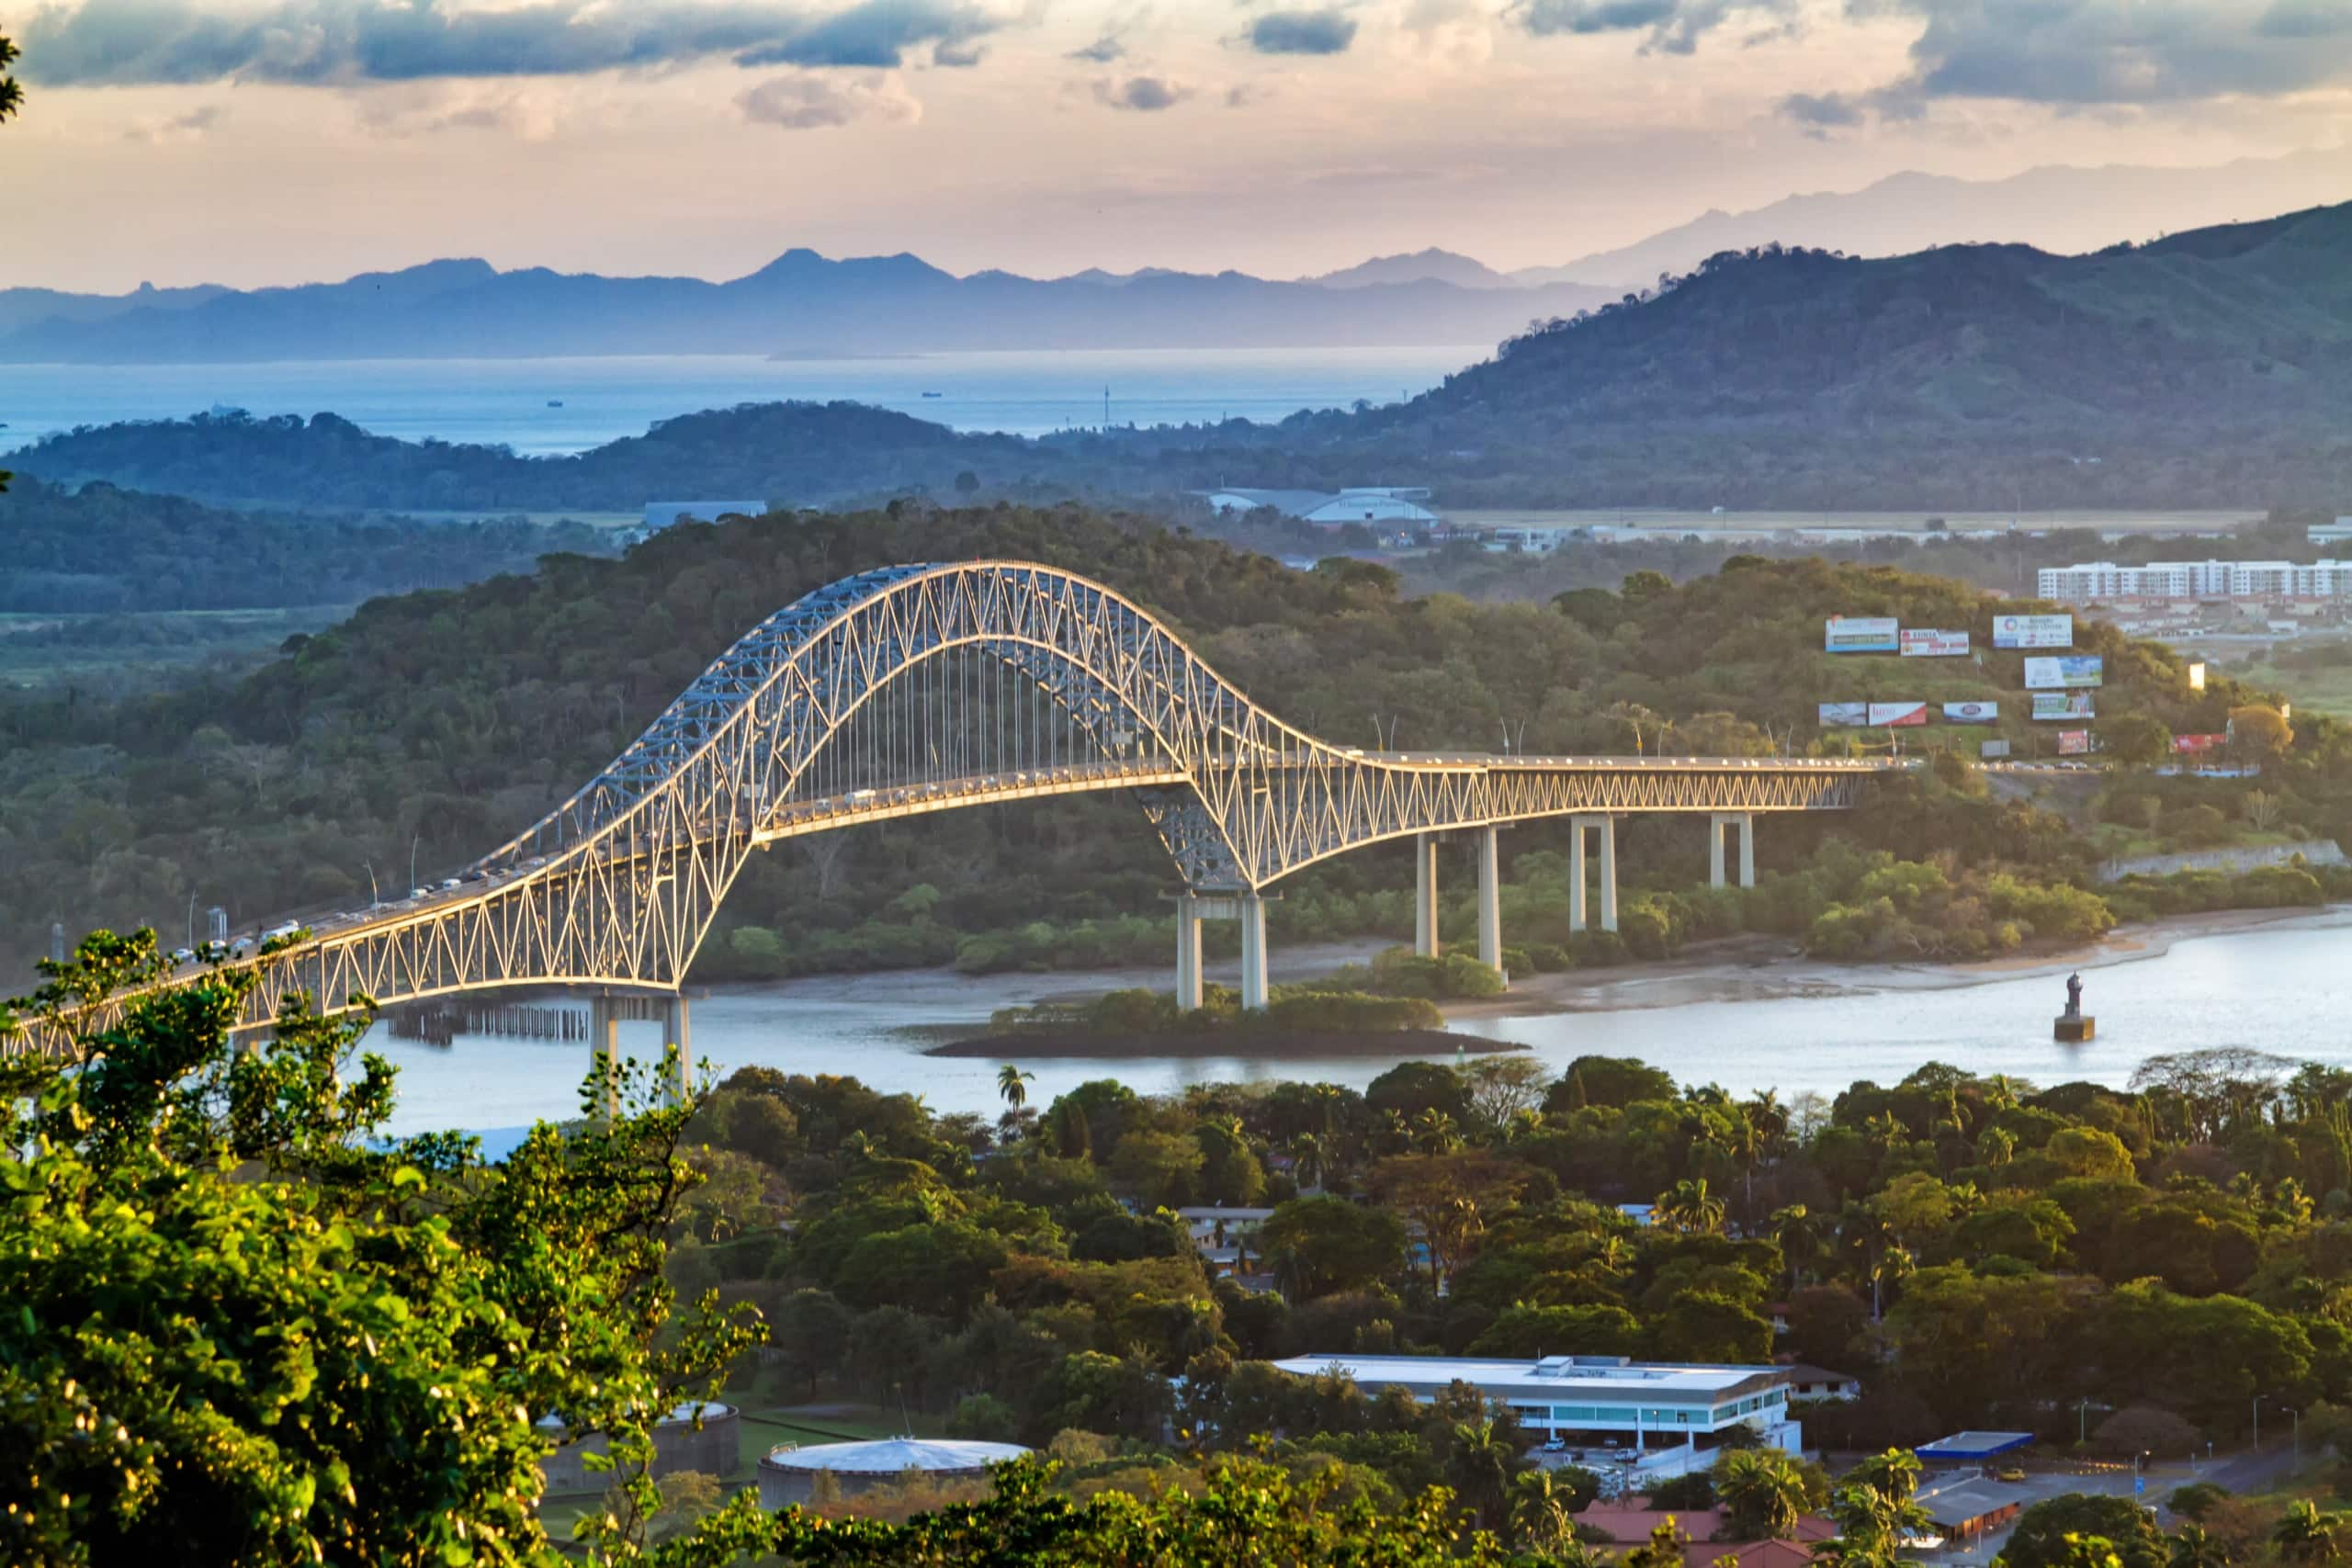 Brücke ragt über Fluss in Panama-Stadt